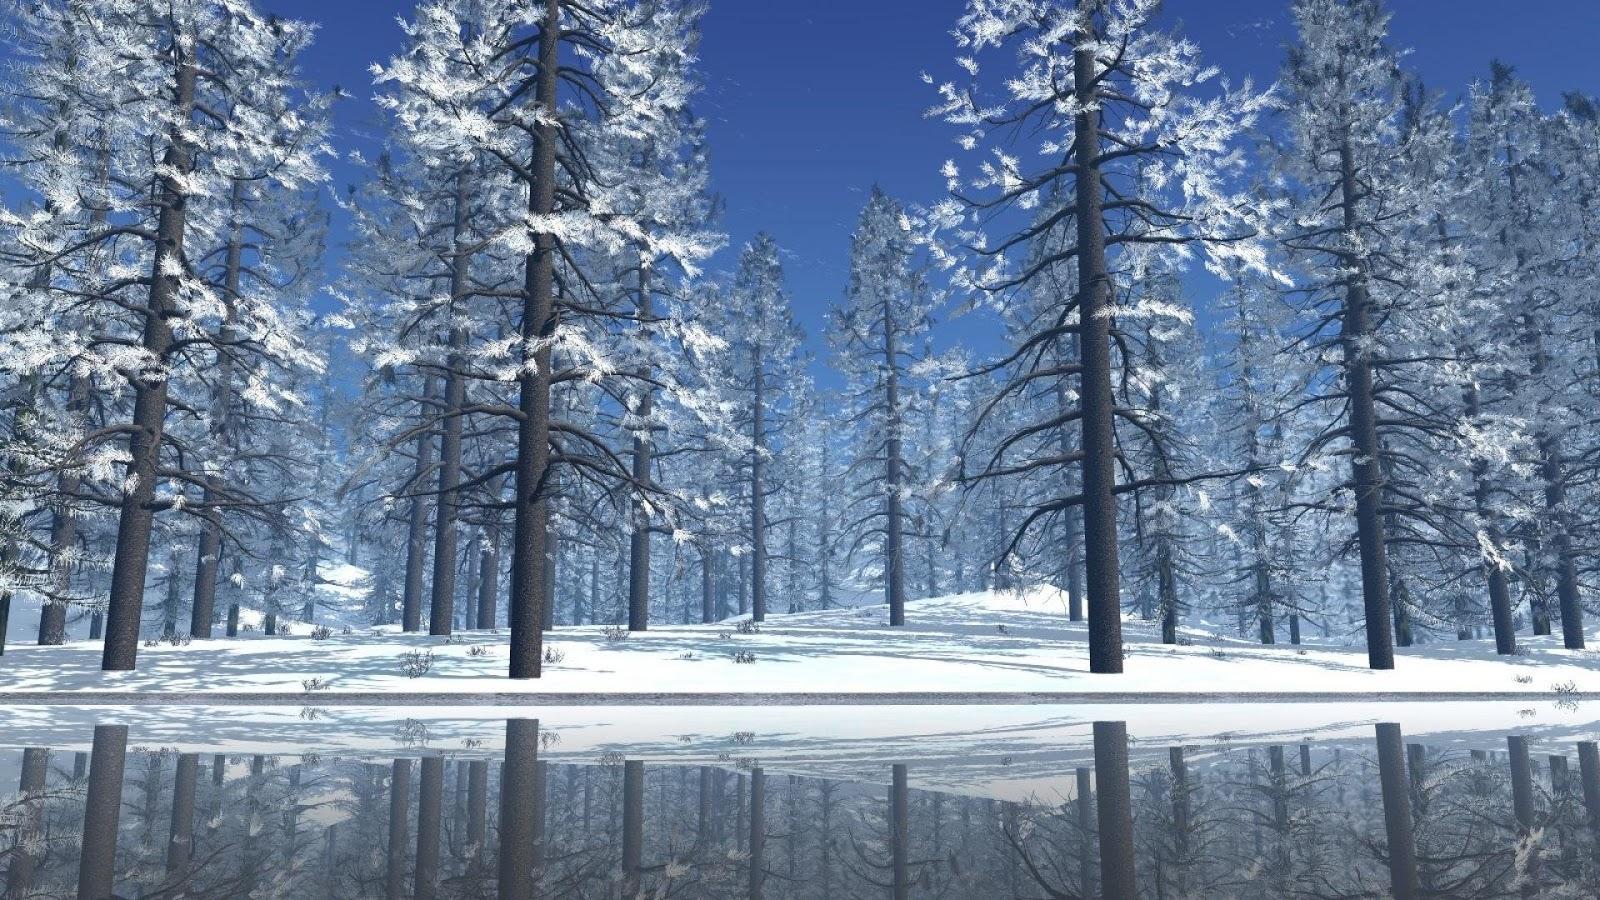 36 Pubg Wallpapers: 57 Christmas Winter Scenes Wallpaper